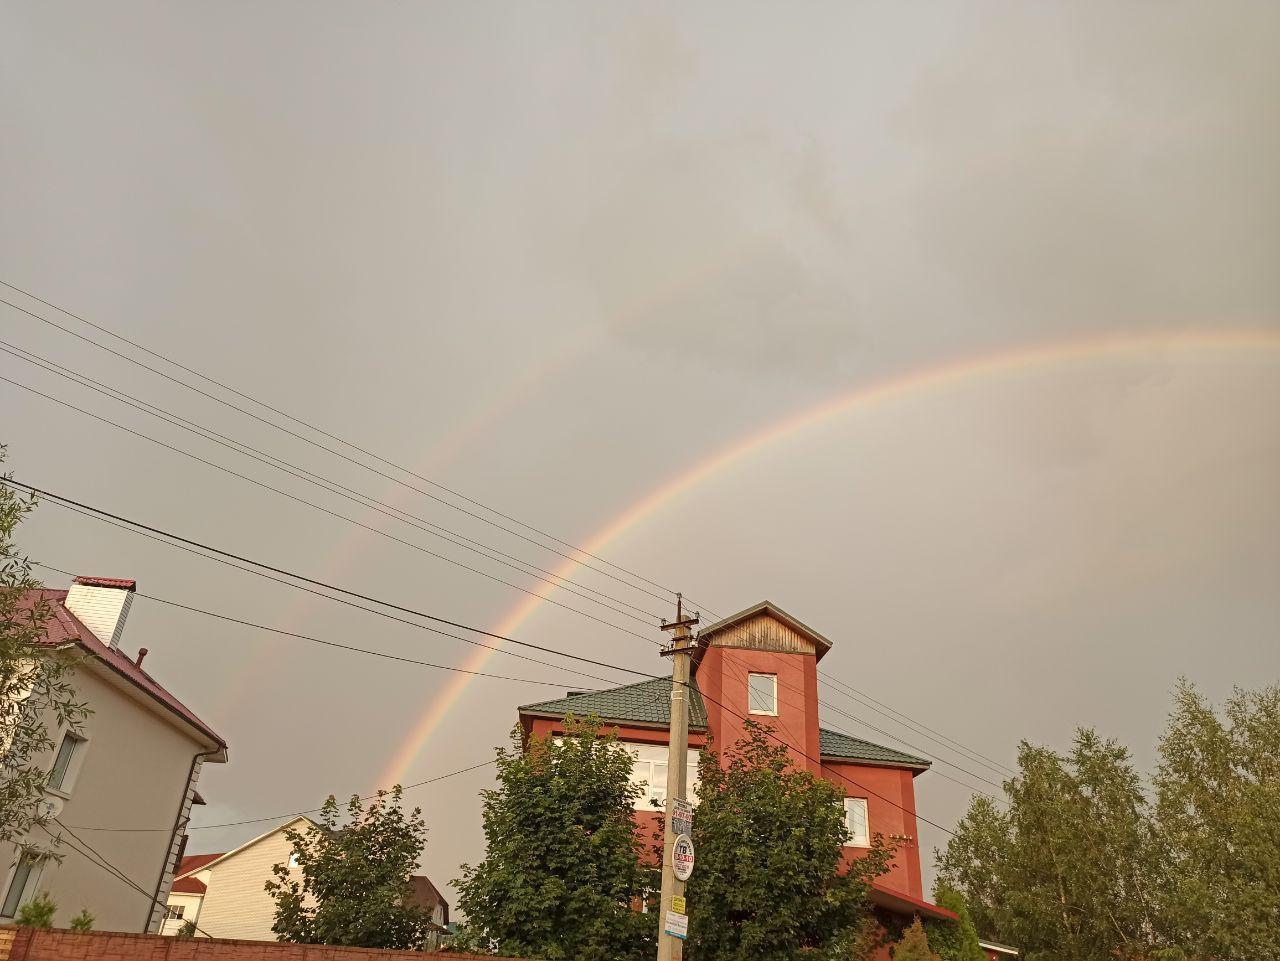 ФОТО: Над Ярославлем появилась двойная радуга